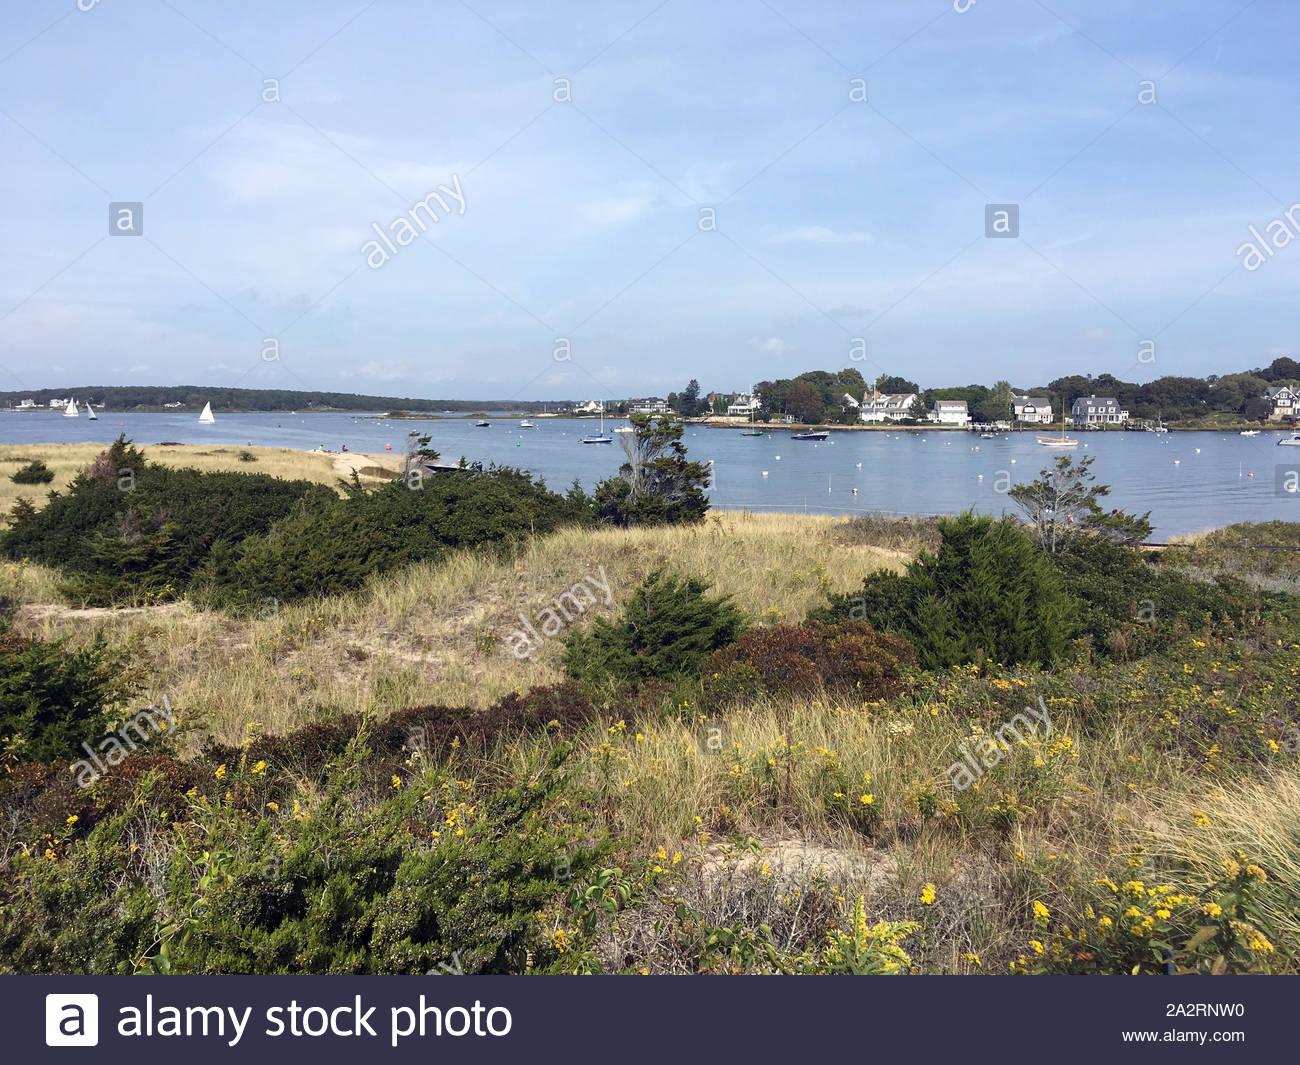 Beach Dunes in Watch Hill in Westerly, Rhode Island Stock Photo